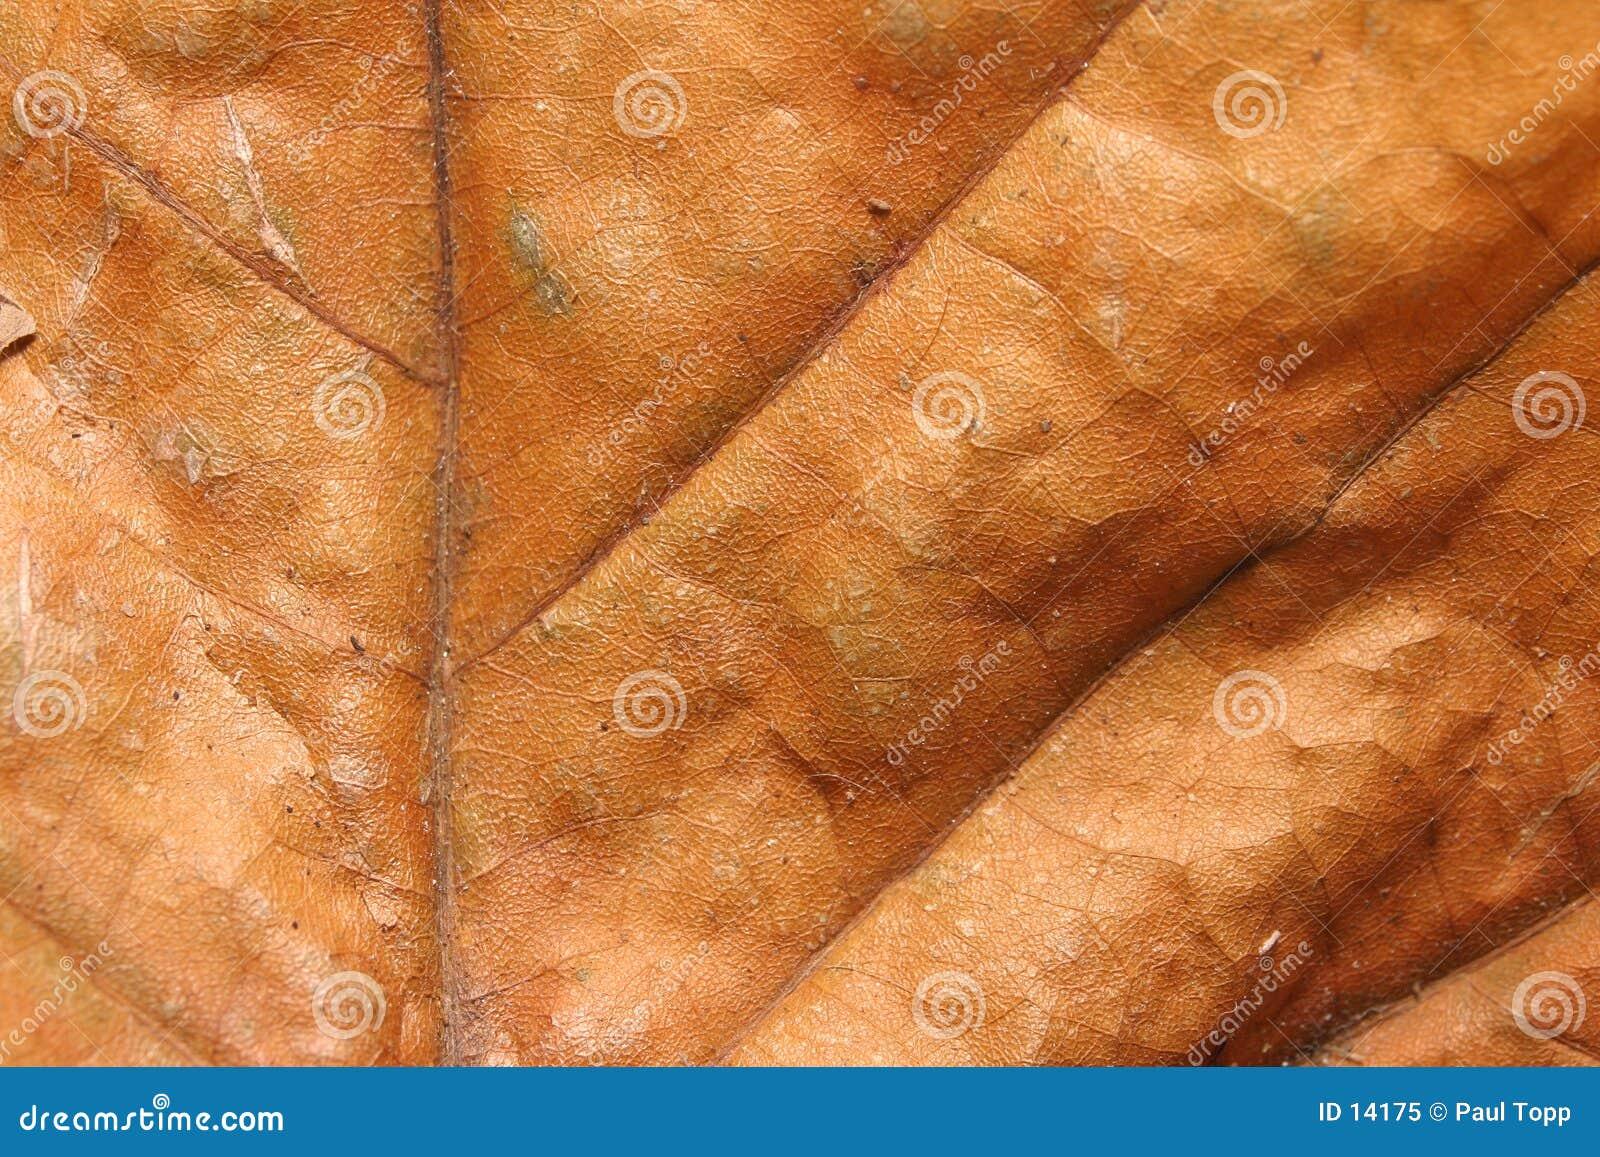 предпосылки сушат текстуру листьев